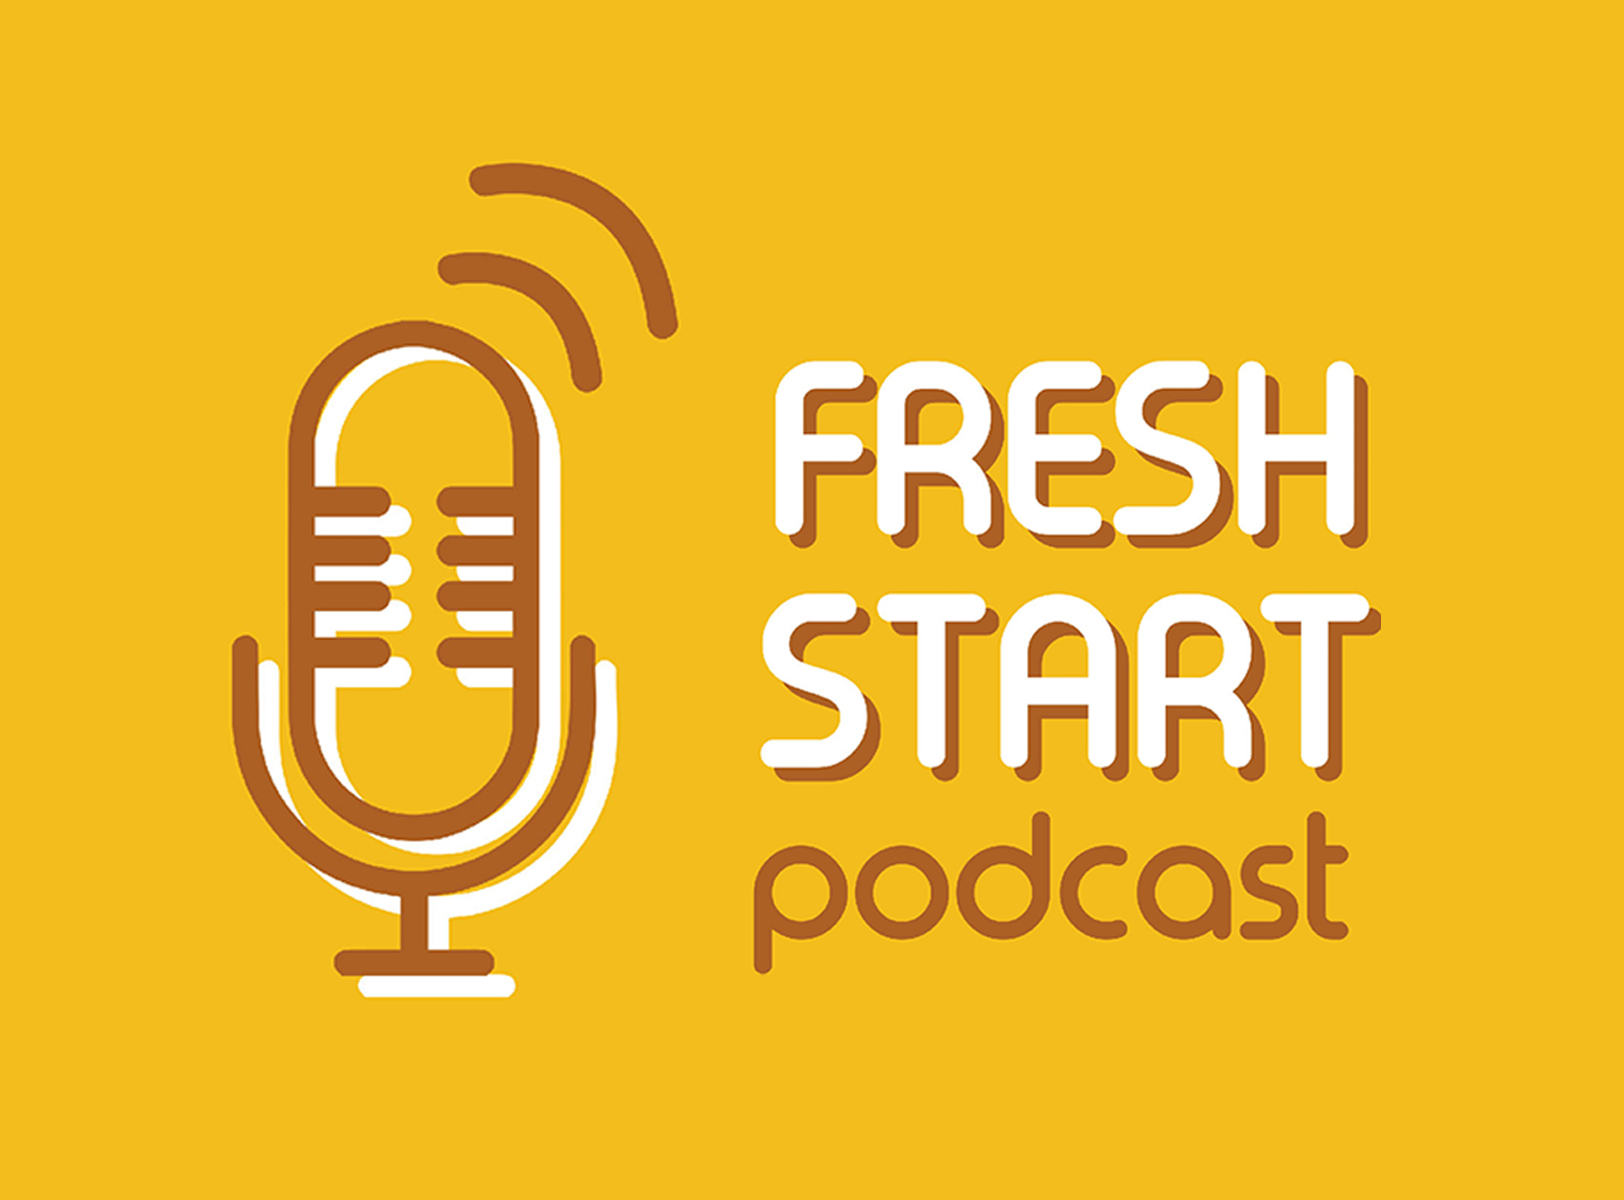 Fresh Start: Podcast News (1/22/2019 Tue.)